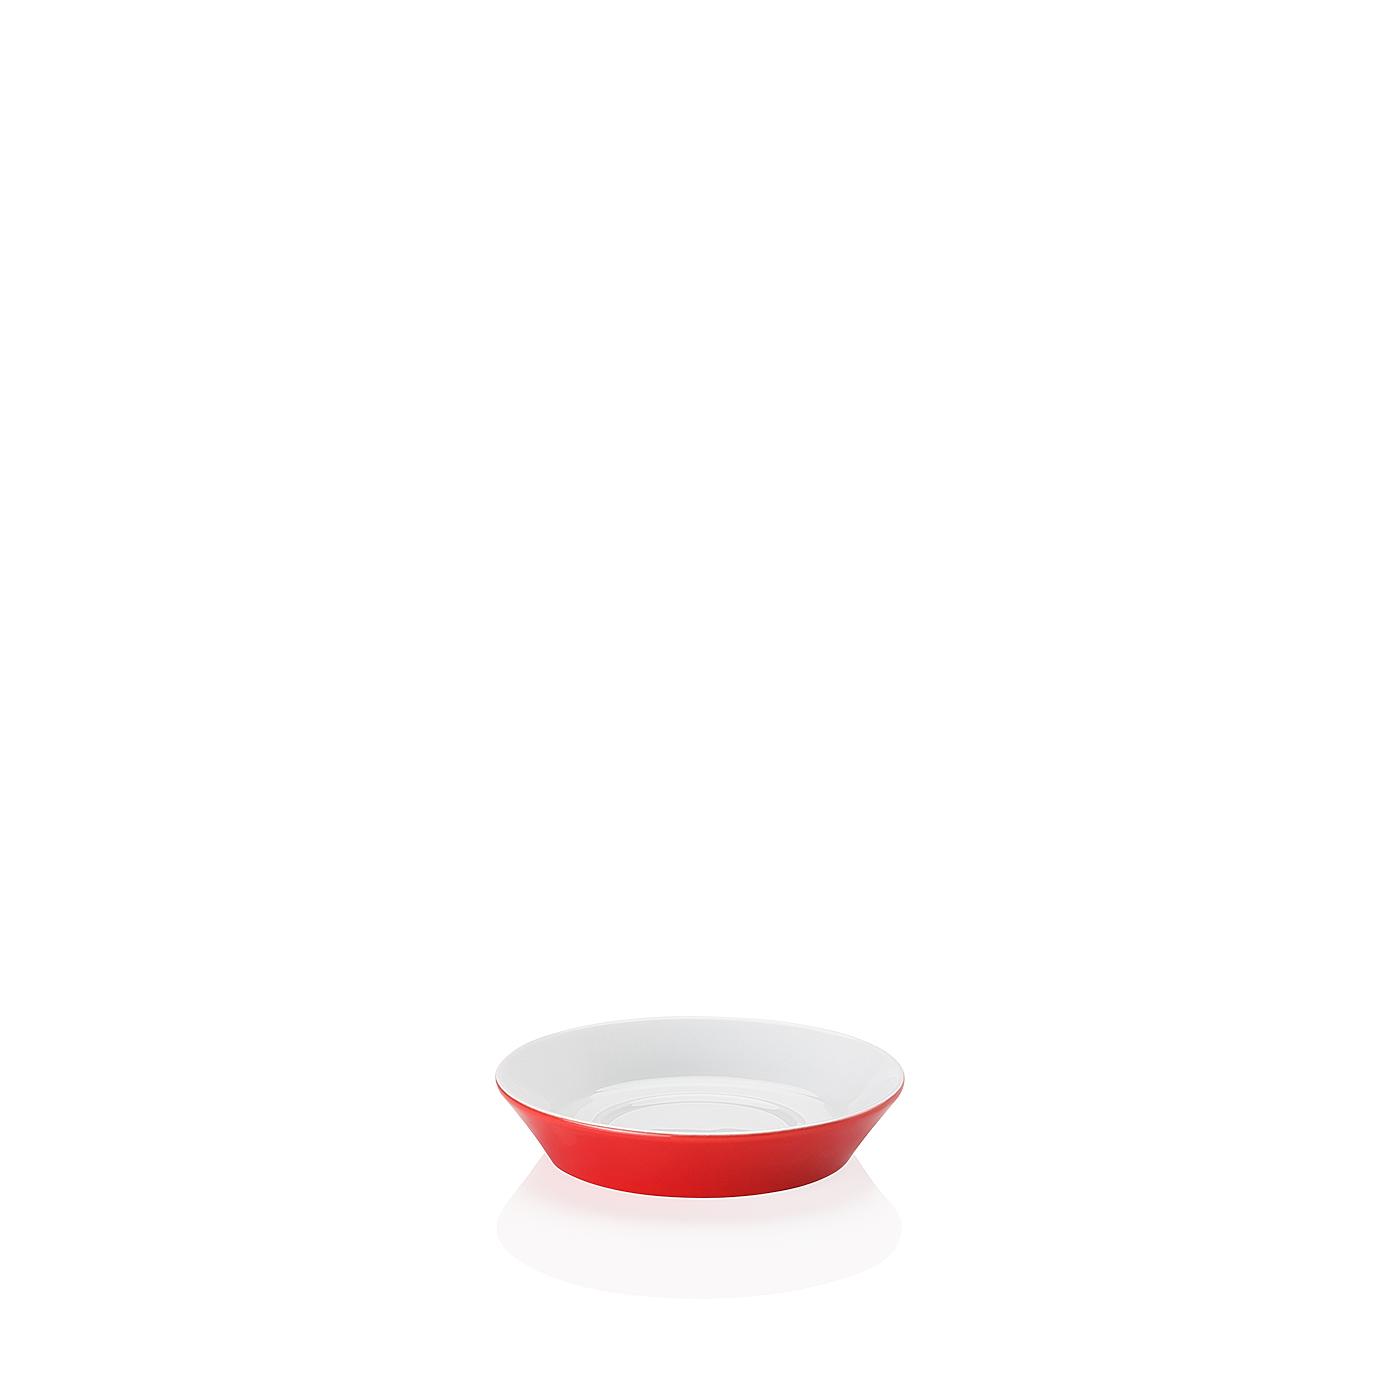 Espresso-/Mokka-Untertasse Tric Hot Arzberg